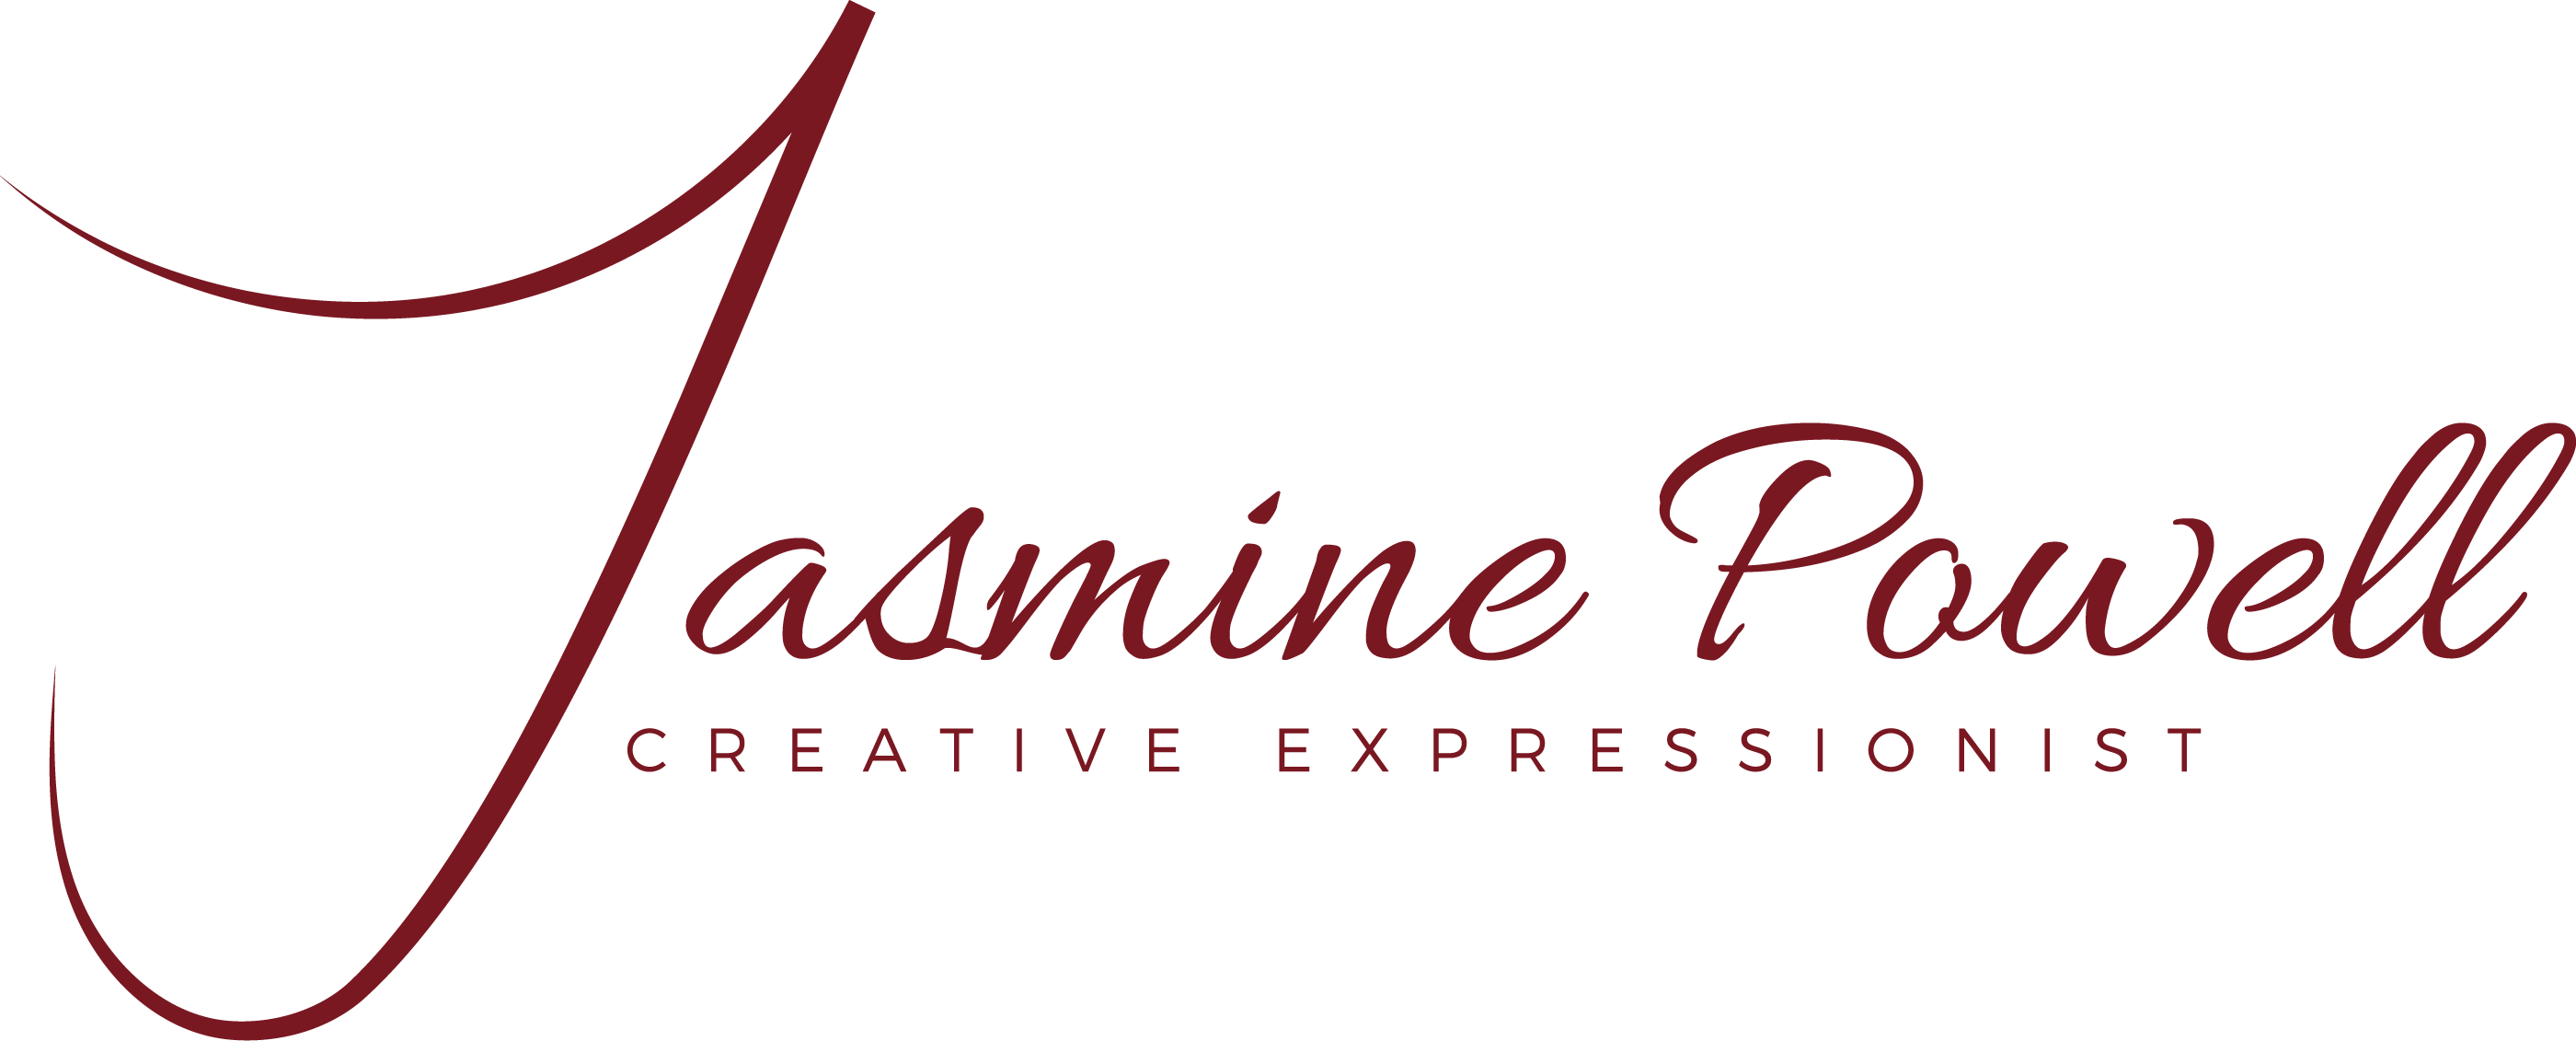 Jasmine Powell Creative Expressionist